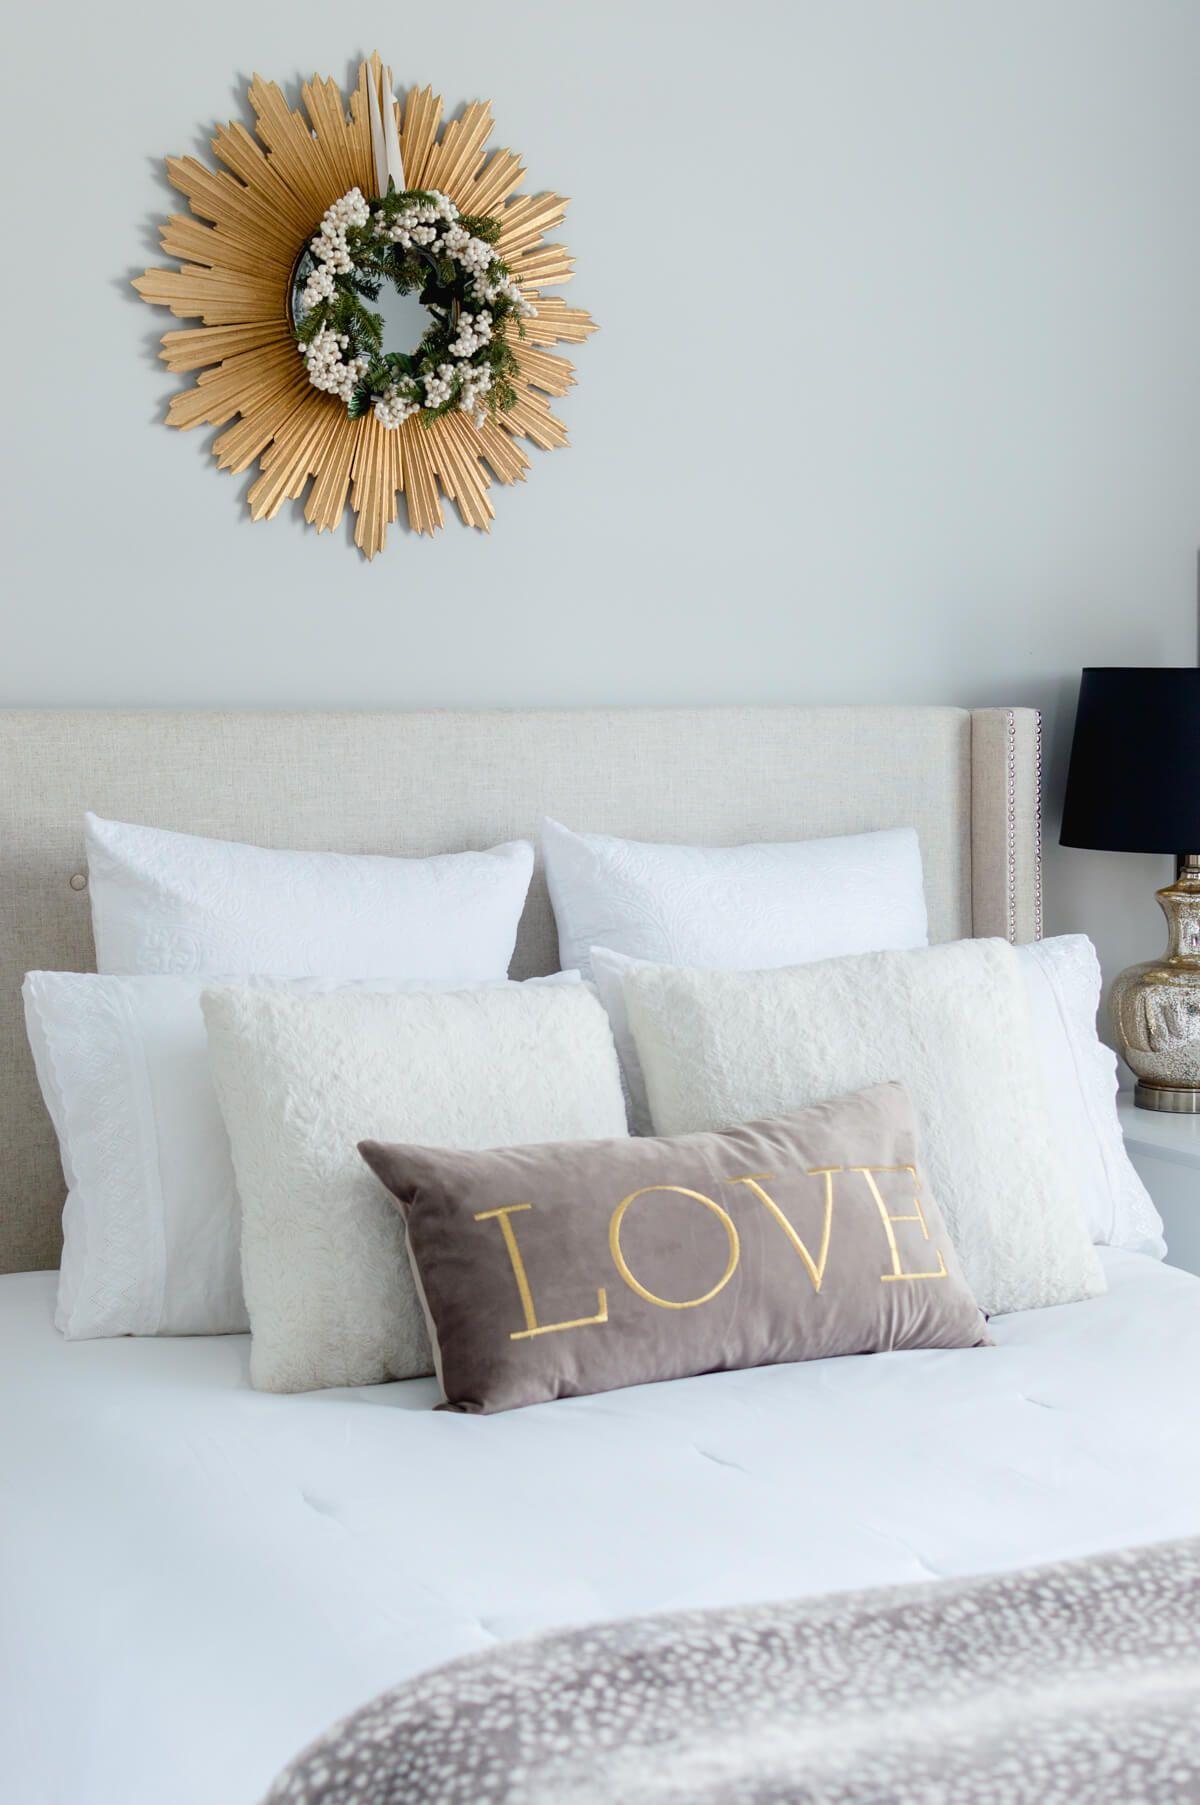 Master bedroom winter decor inspiration. | room decor | bedroom decoration | pillow styling | thehomeicreate.com #winterdecorating #bedroomdecor